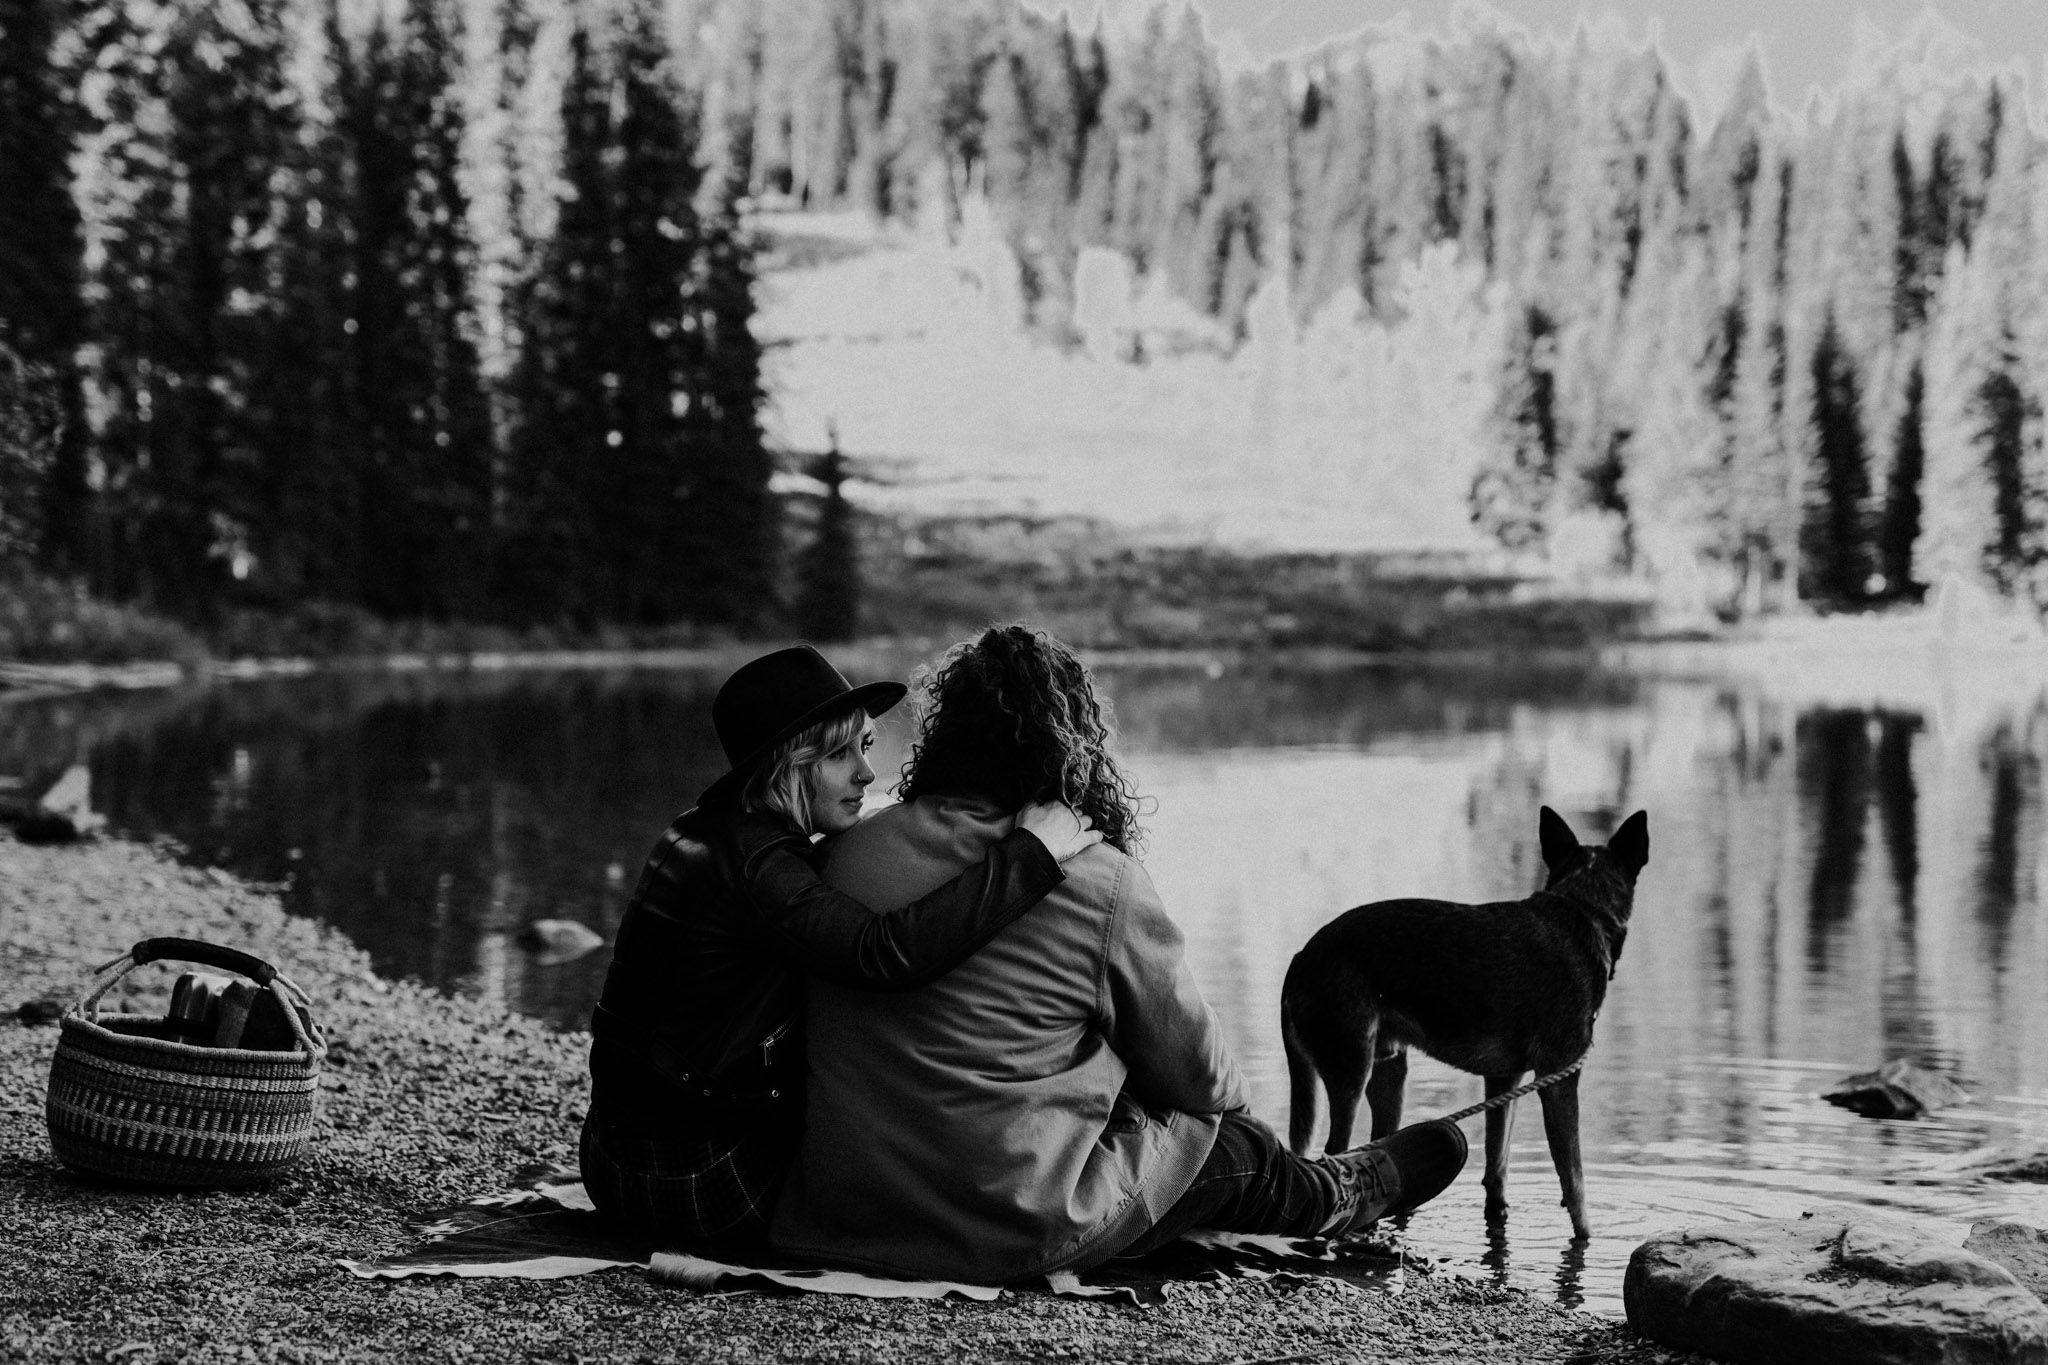 Emerald Lake - at the lake with the dog